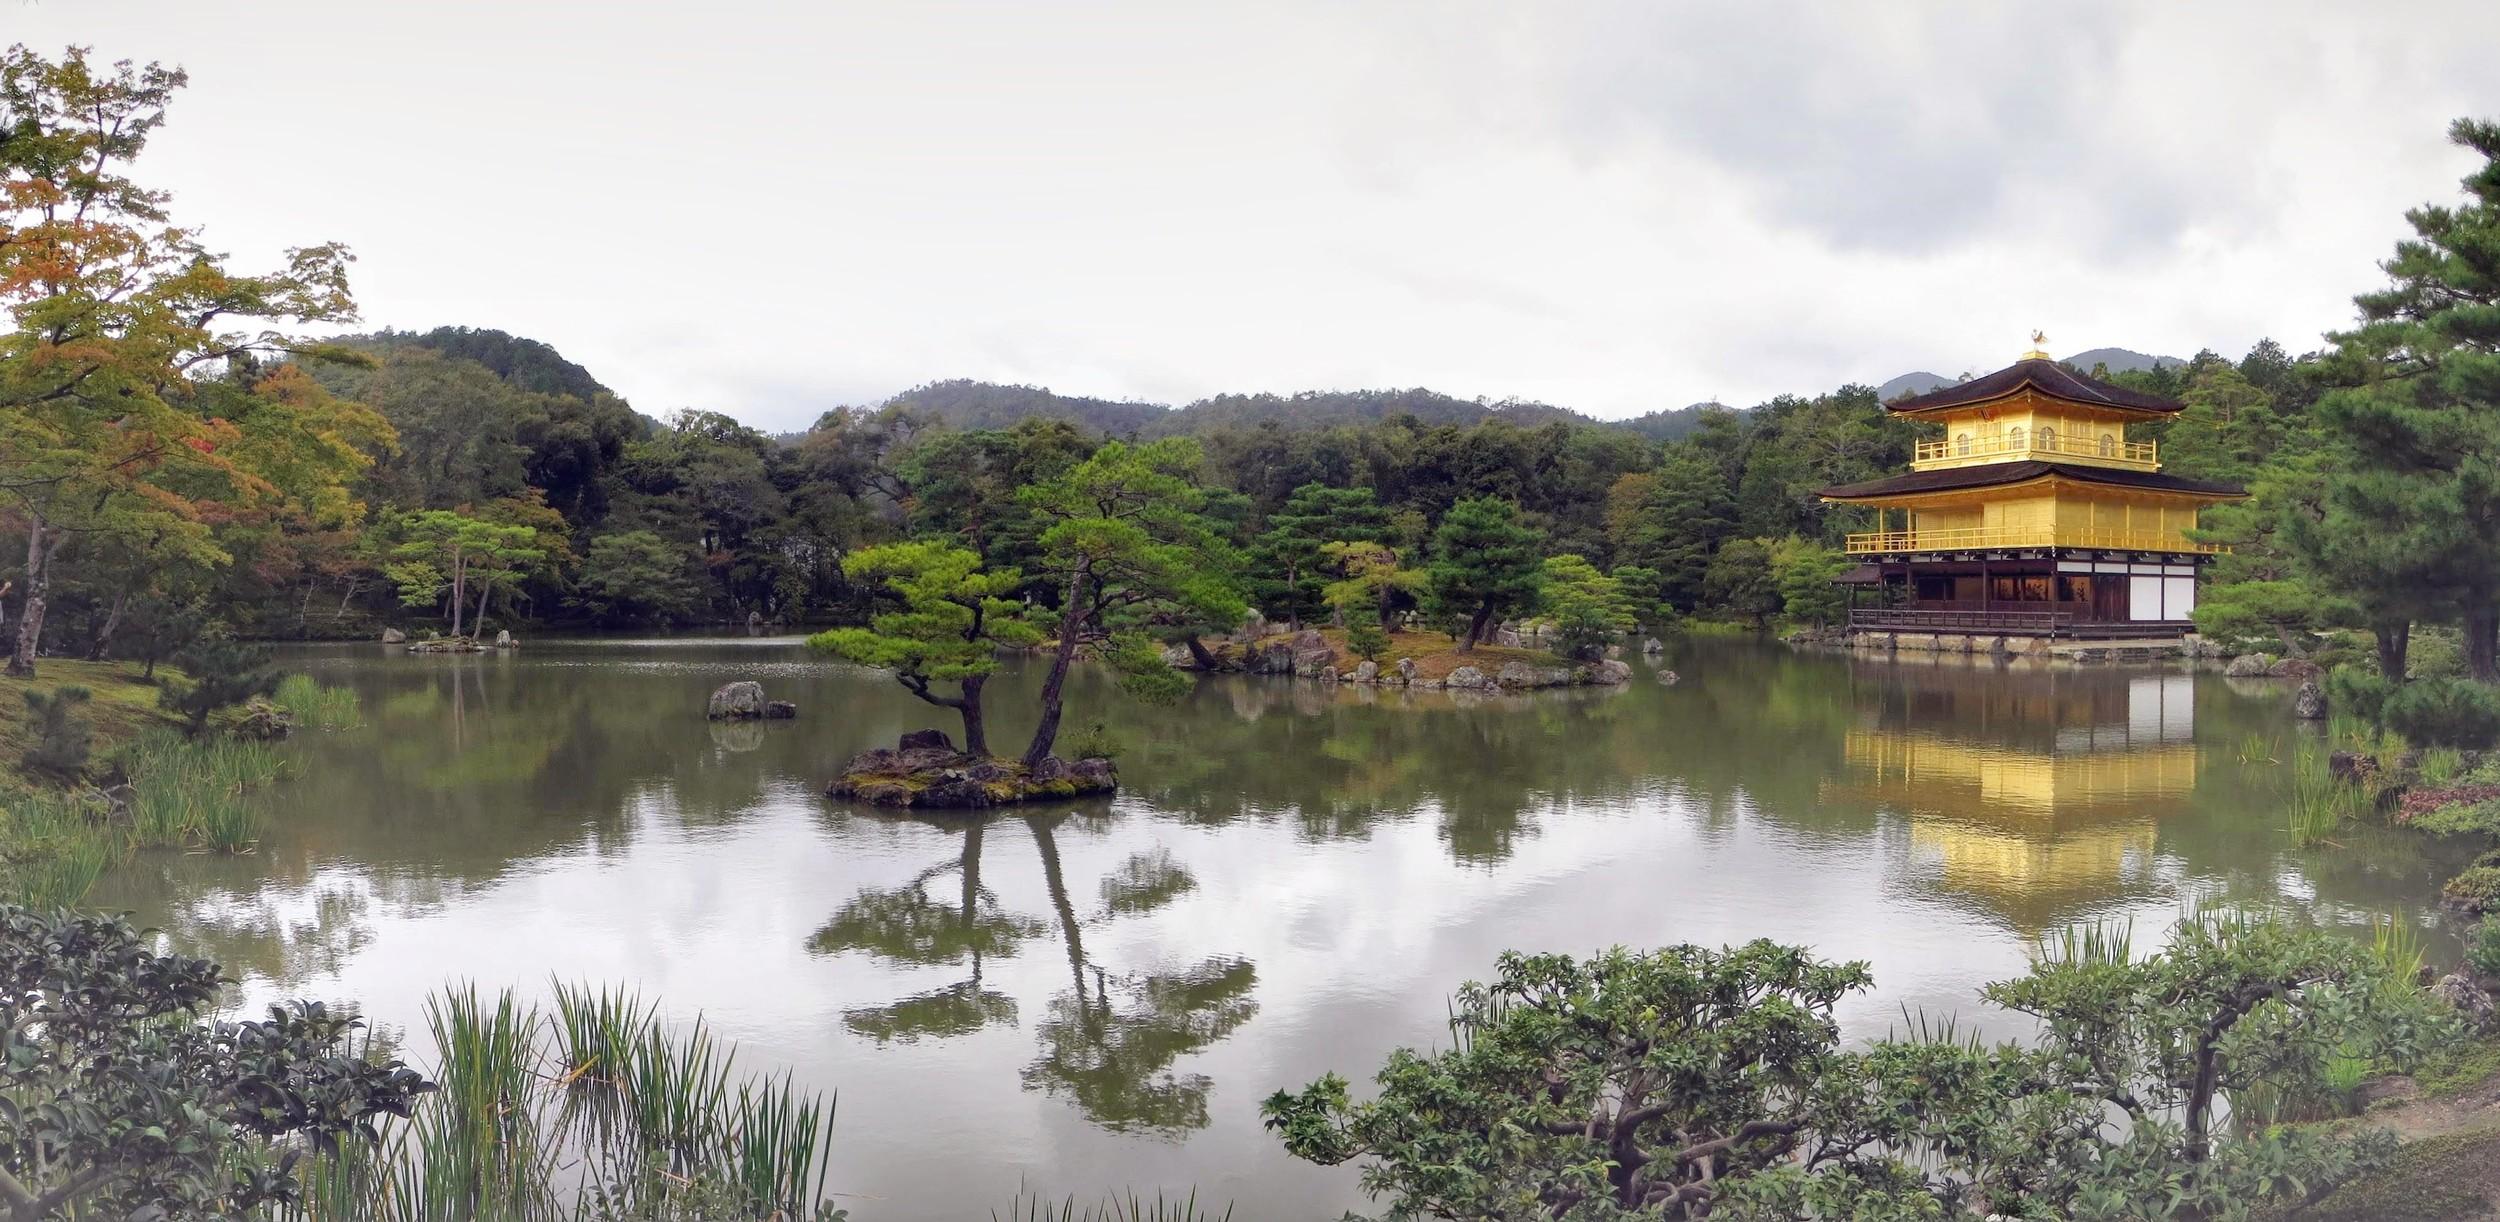 Japan   October 8th - October 17th